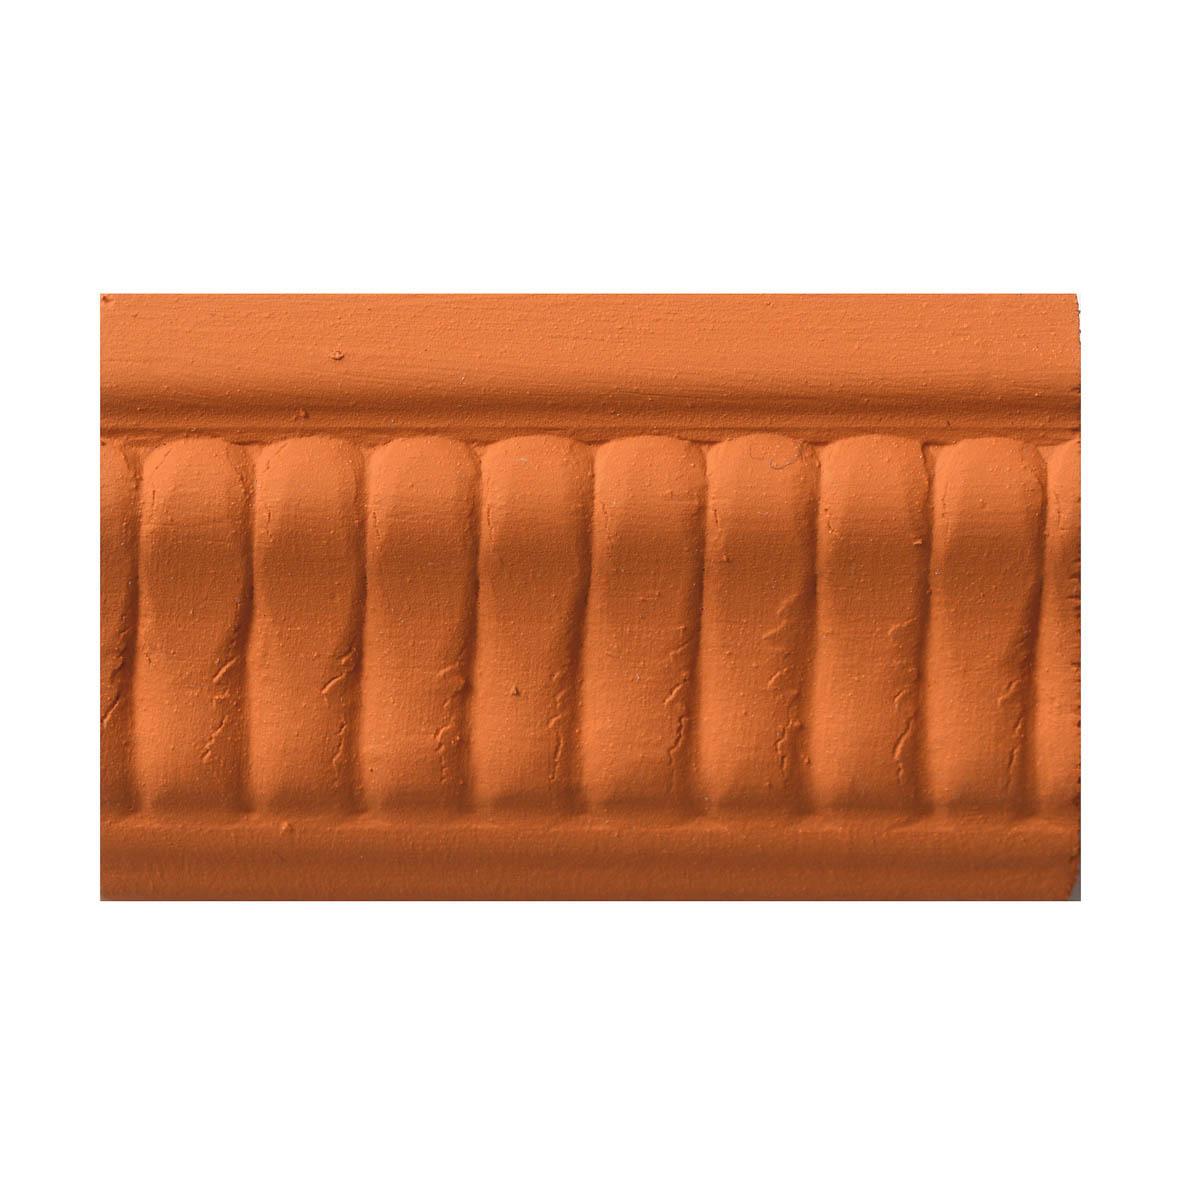 Waverly ® Inspirations Chalk Acrylic Paint - Pumpkin, 8 oz.